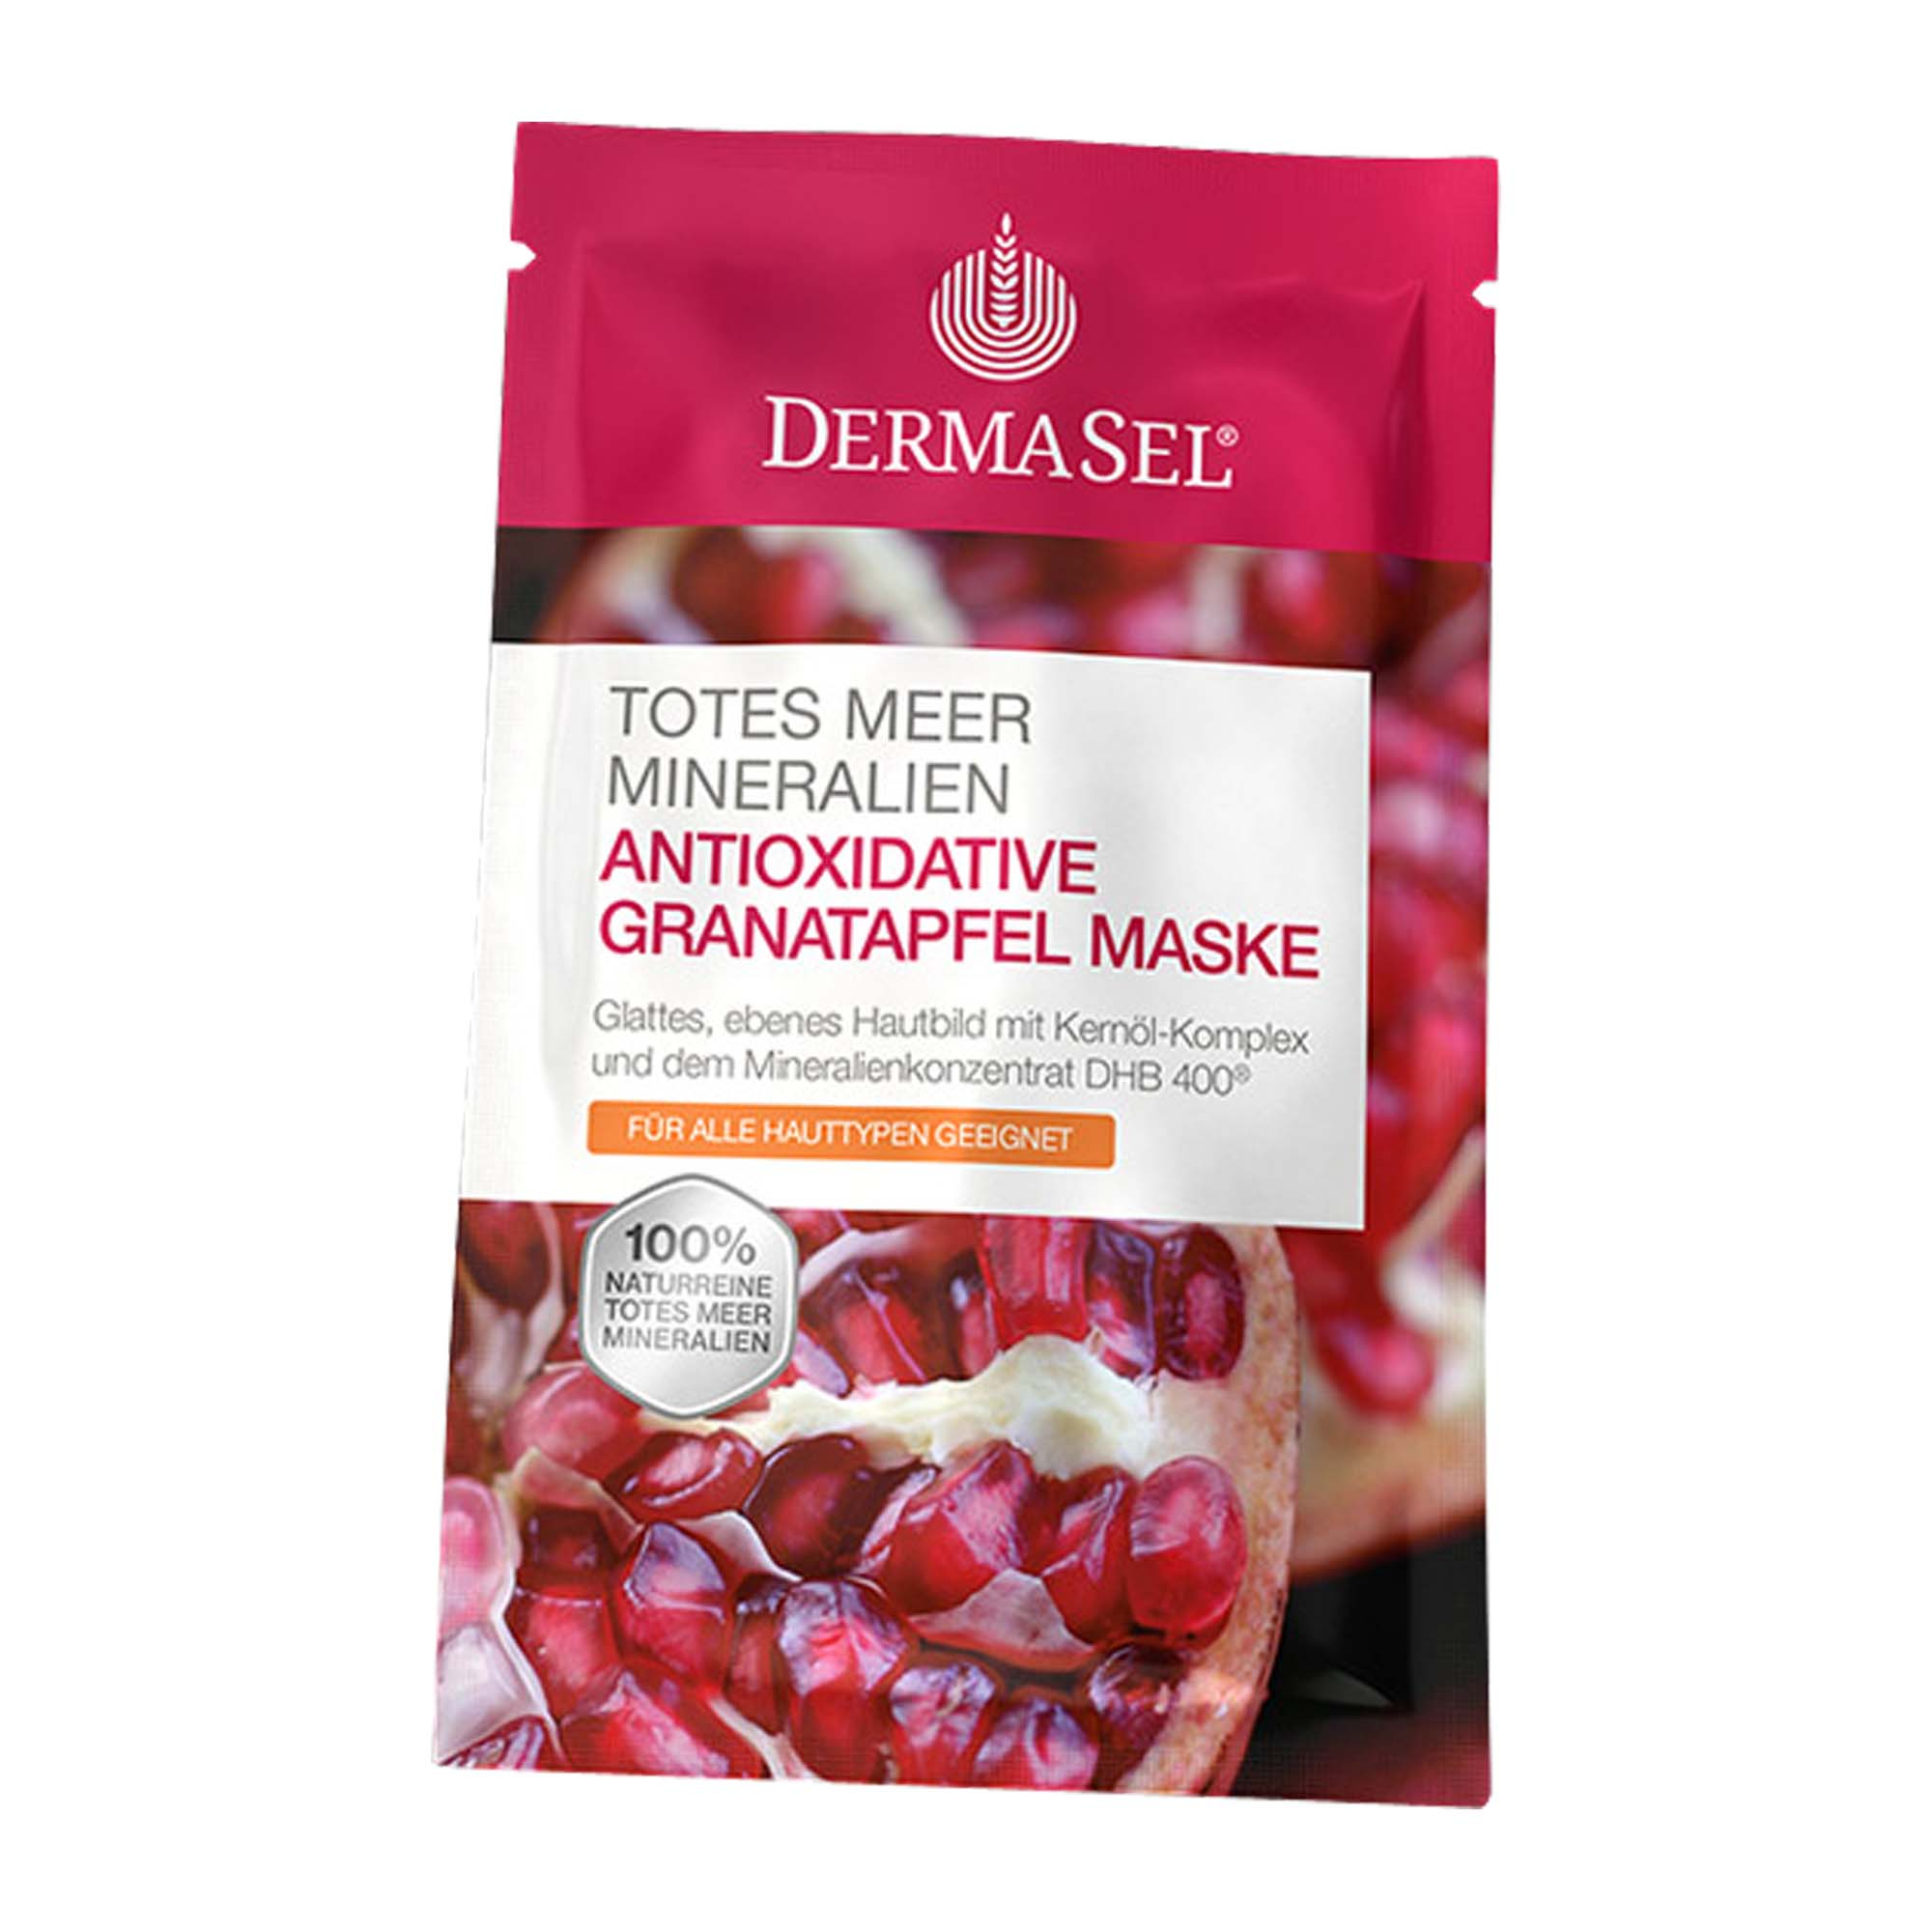 DermaSel Spa Totes Meer Maske Granatapfel